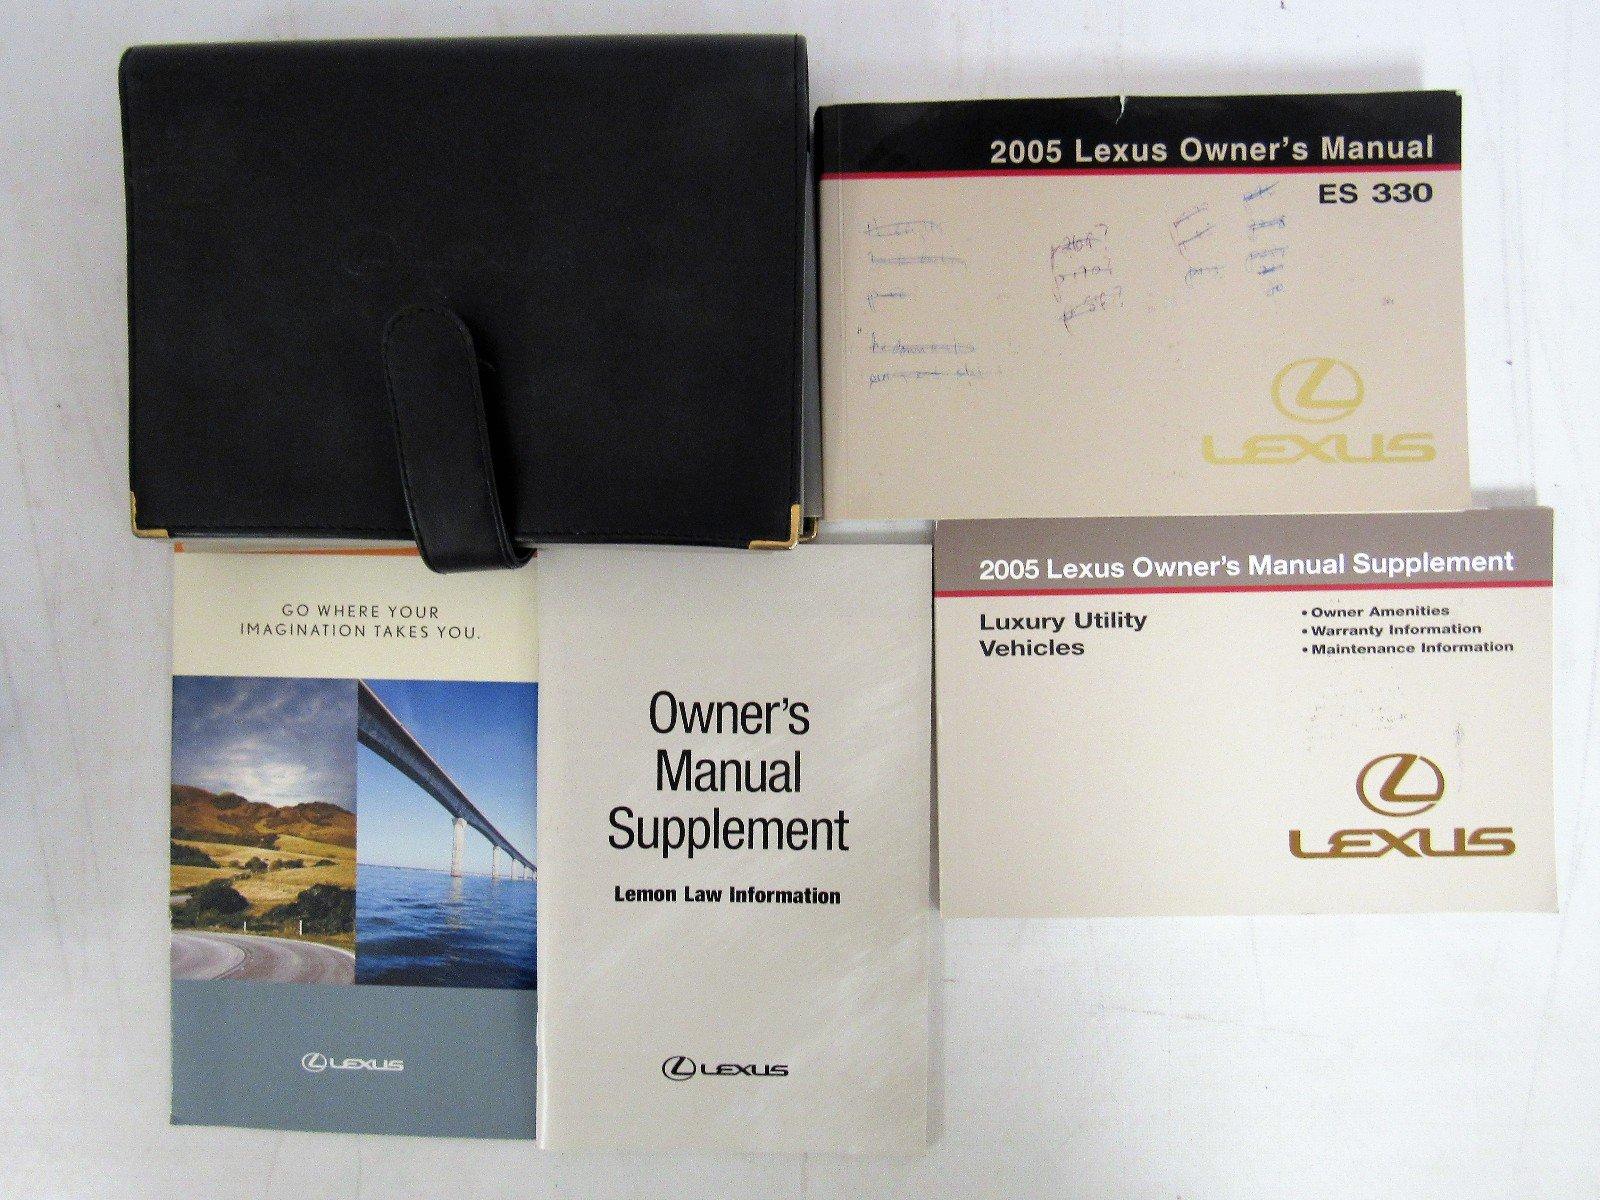 2005 lexus es 330 owners manual guide book lexus amazon com books rh amazon com 2005 lexus gx470 owners manual pdf 2005 lexus es 330 owners manual pdf